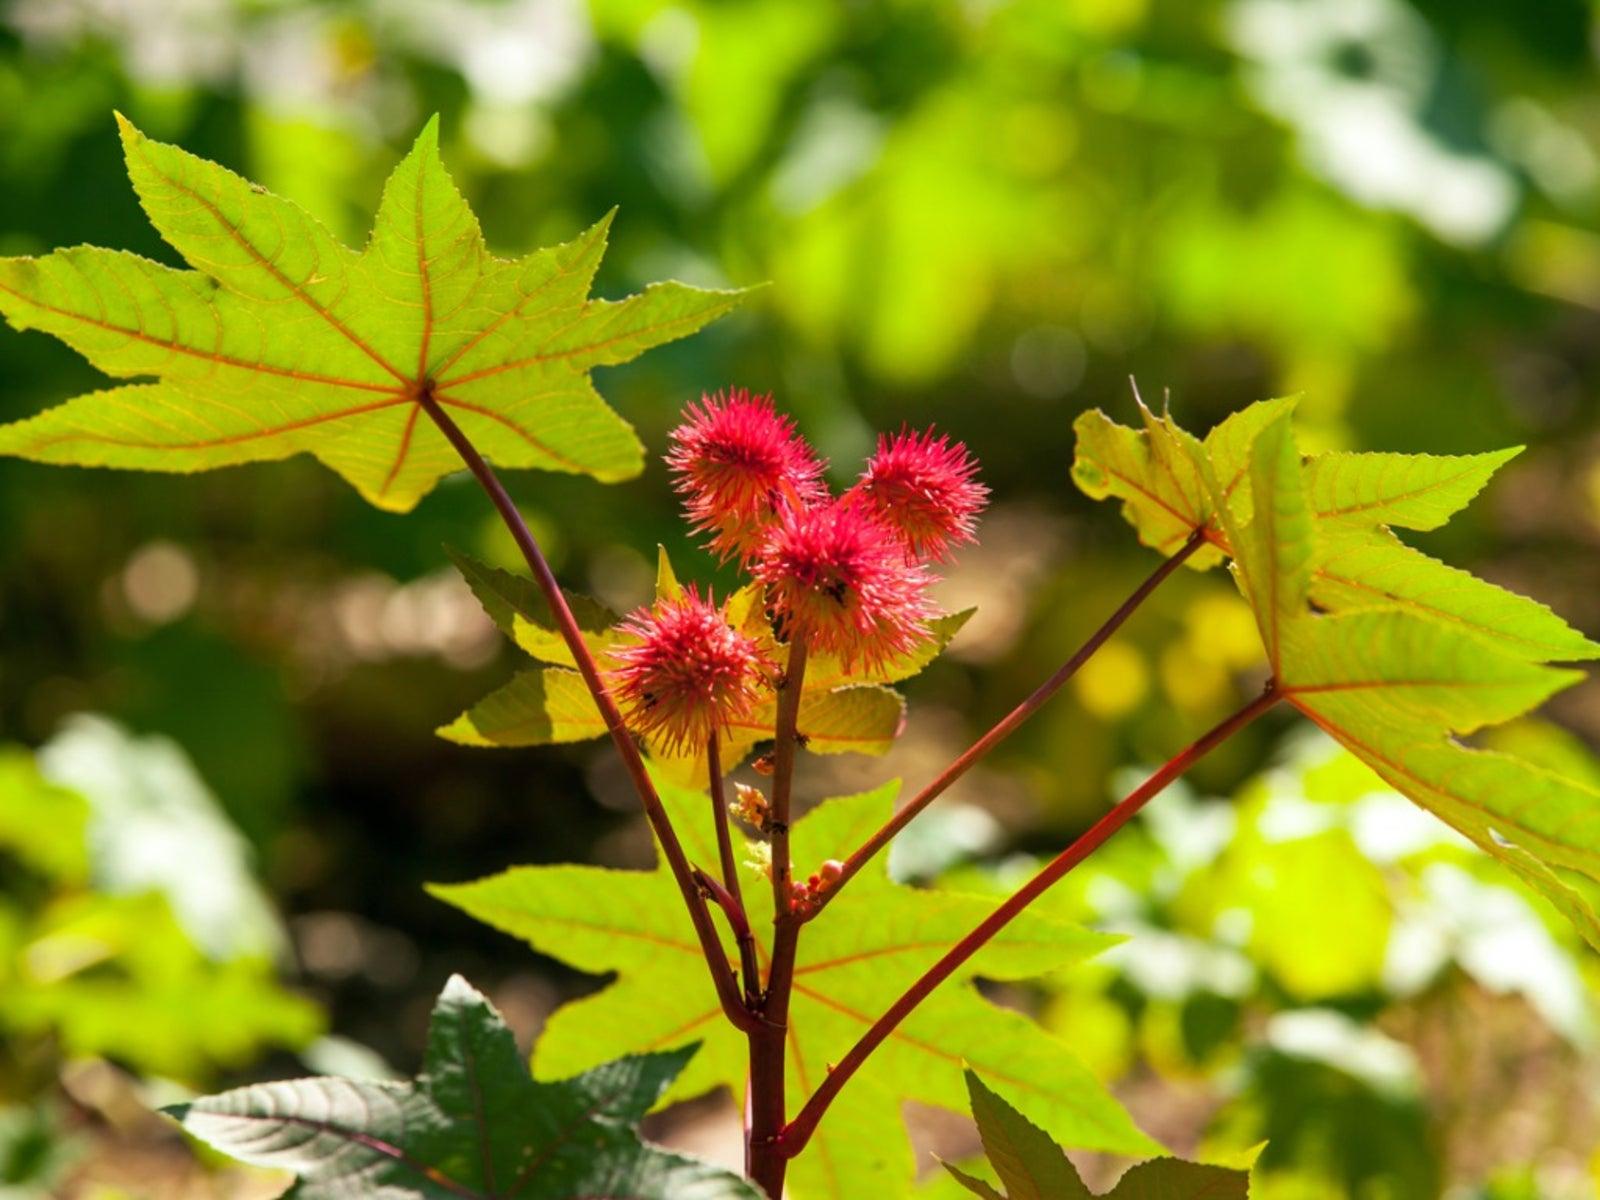 Castor Bean Plants: Information For Growing Castor Beans Safely